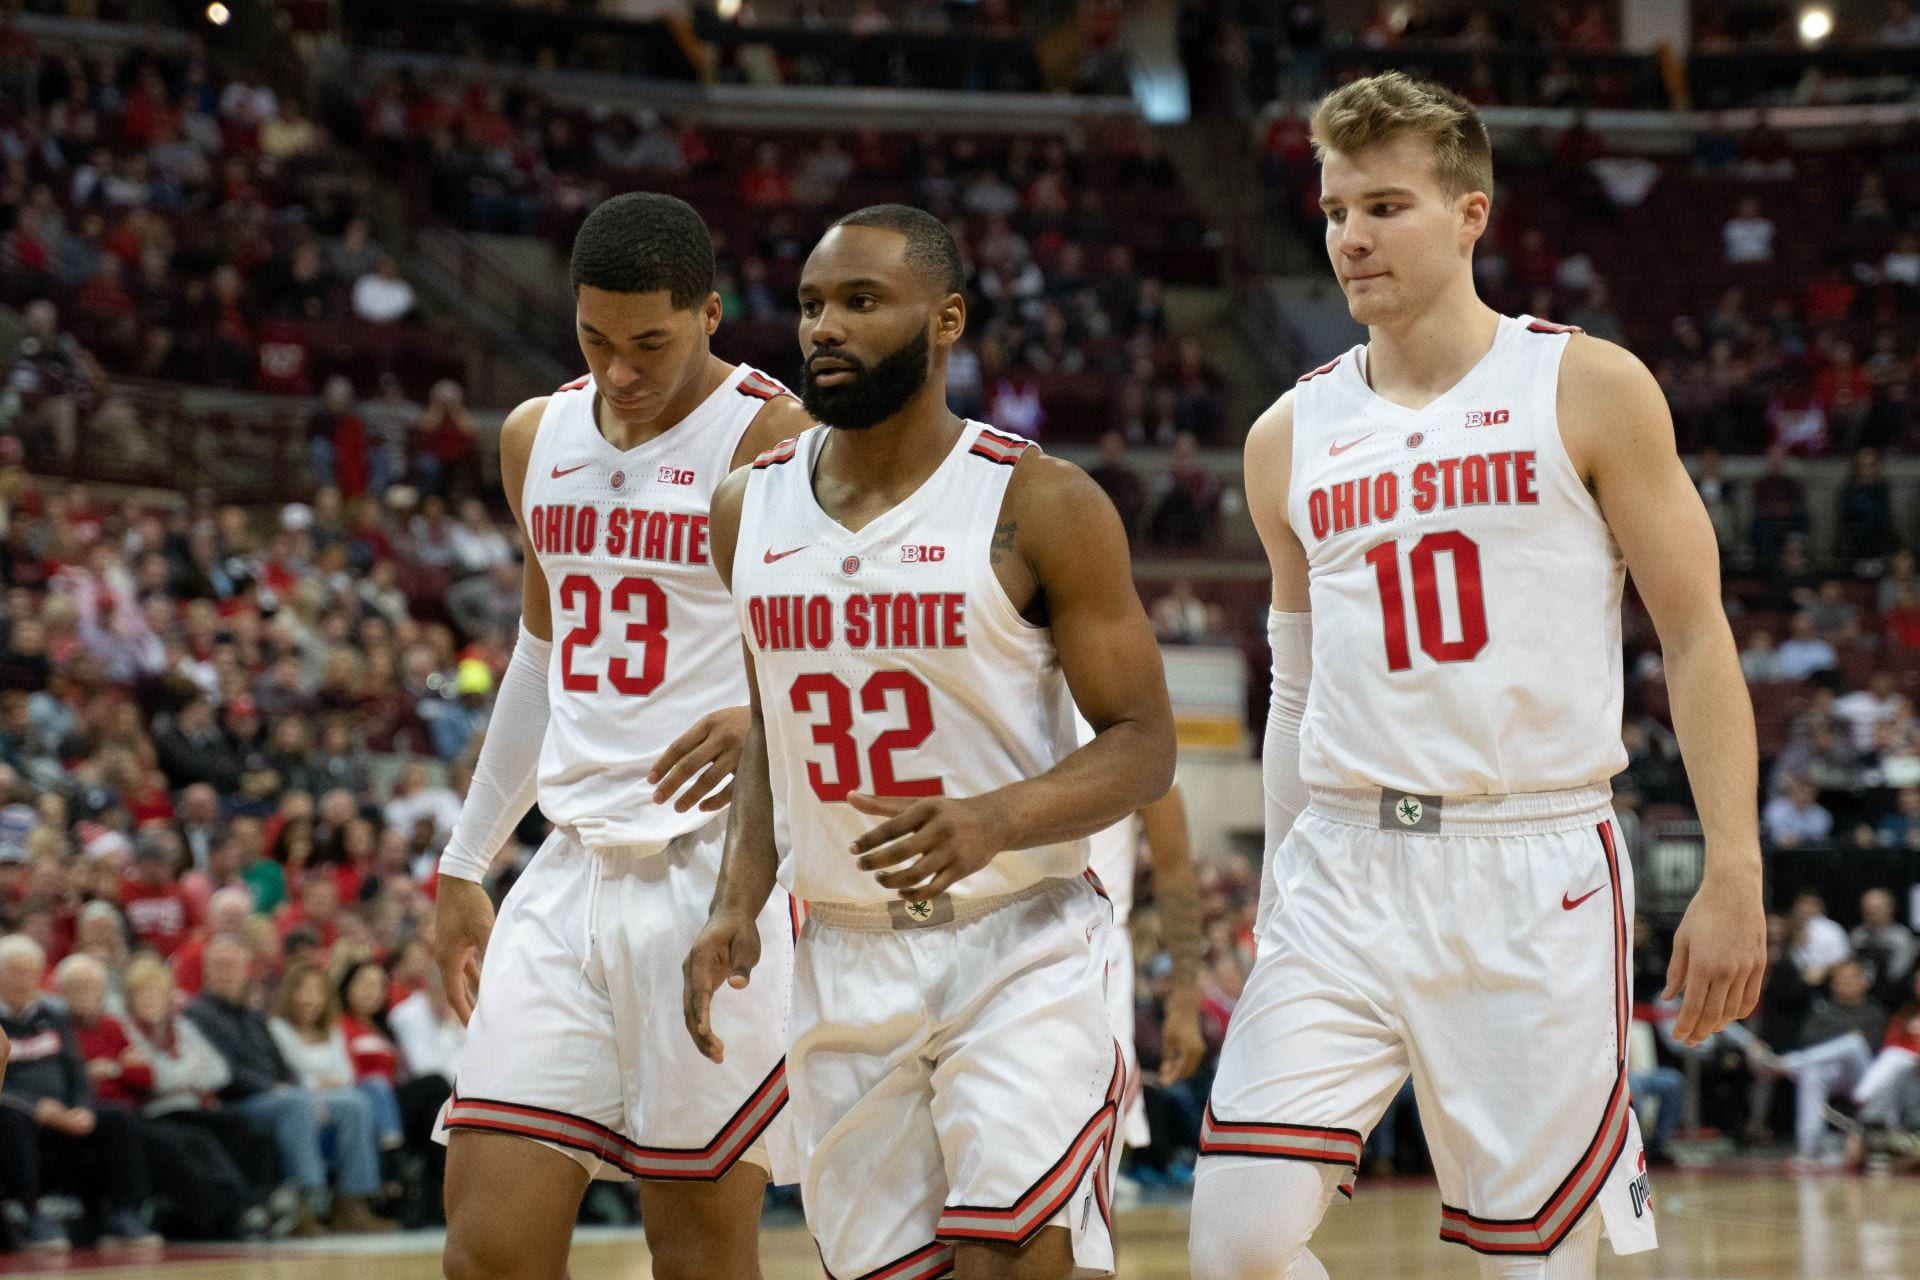 Men's Basketball: Ohio State upsets Iowa State 62-59 in NCAA Tournament